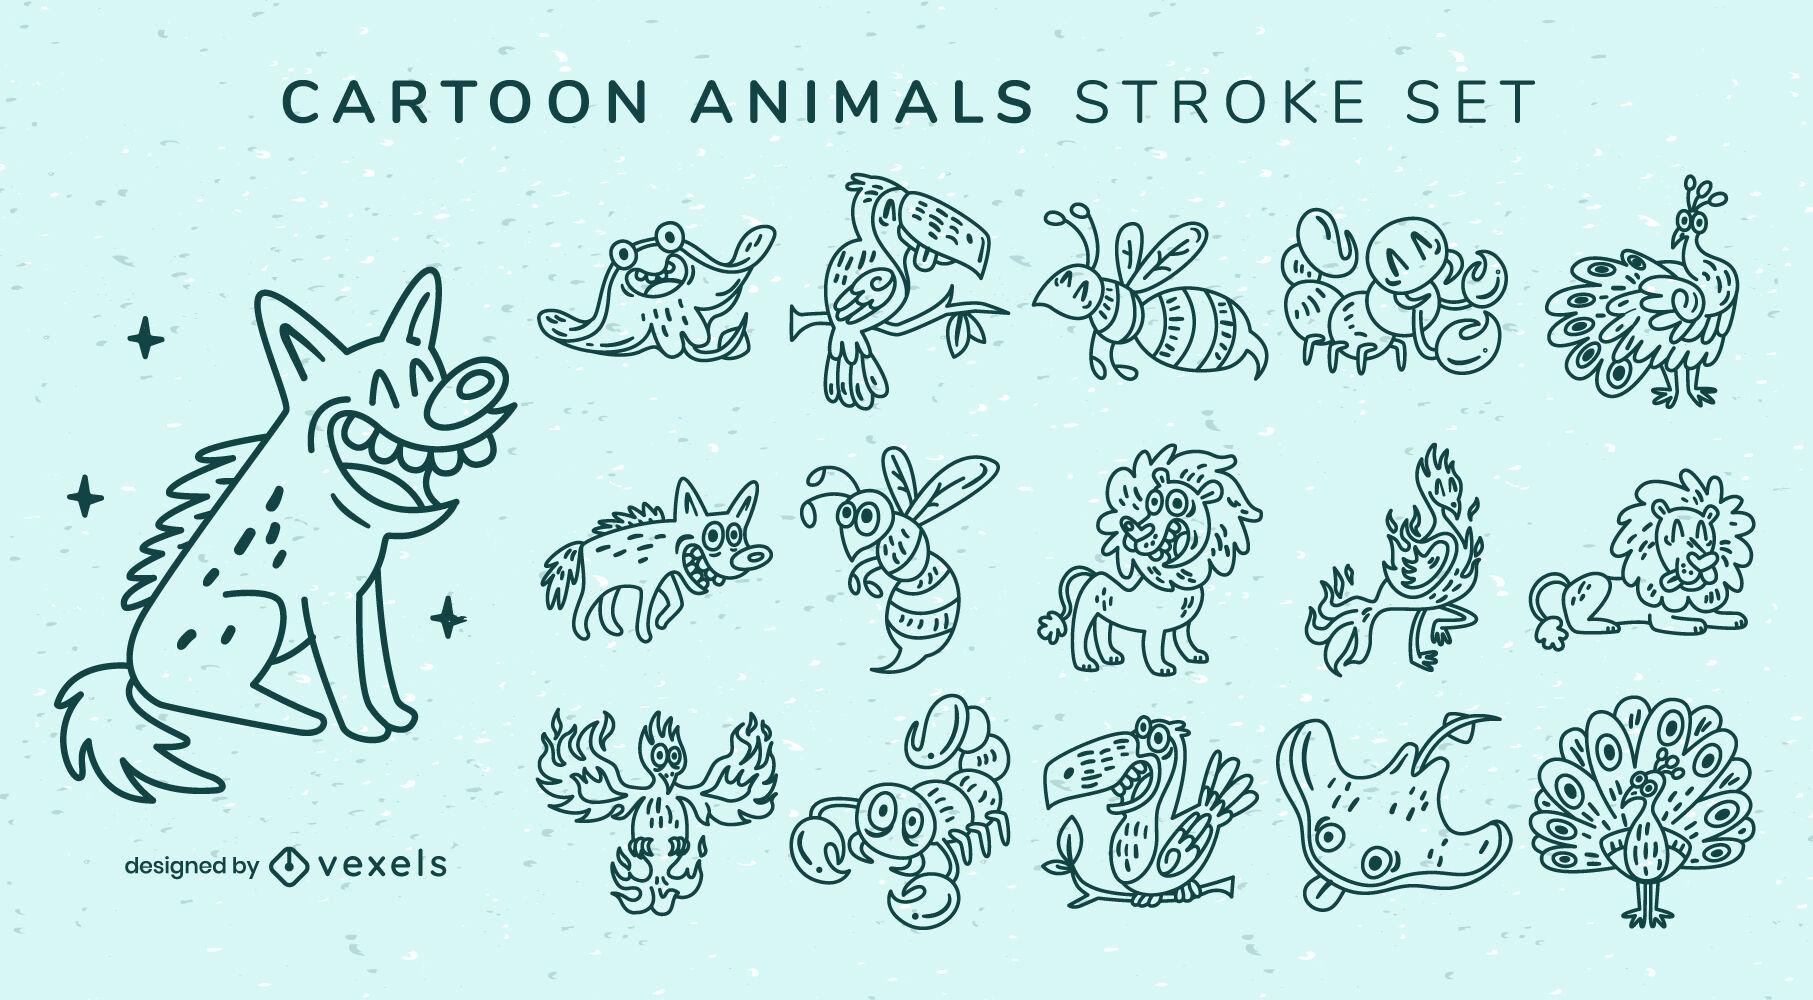 Animal cartoon set stroke